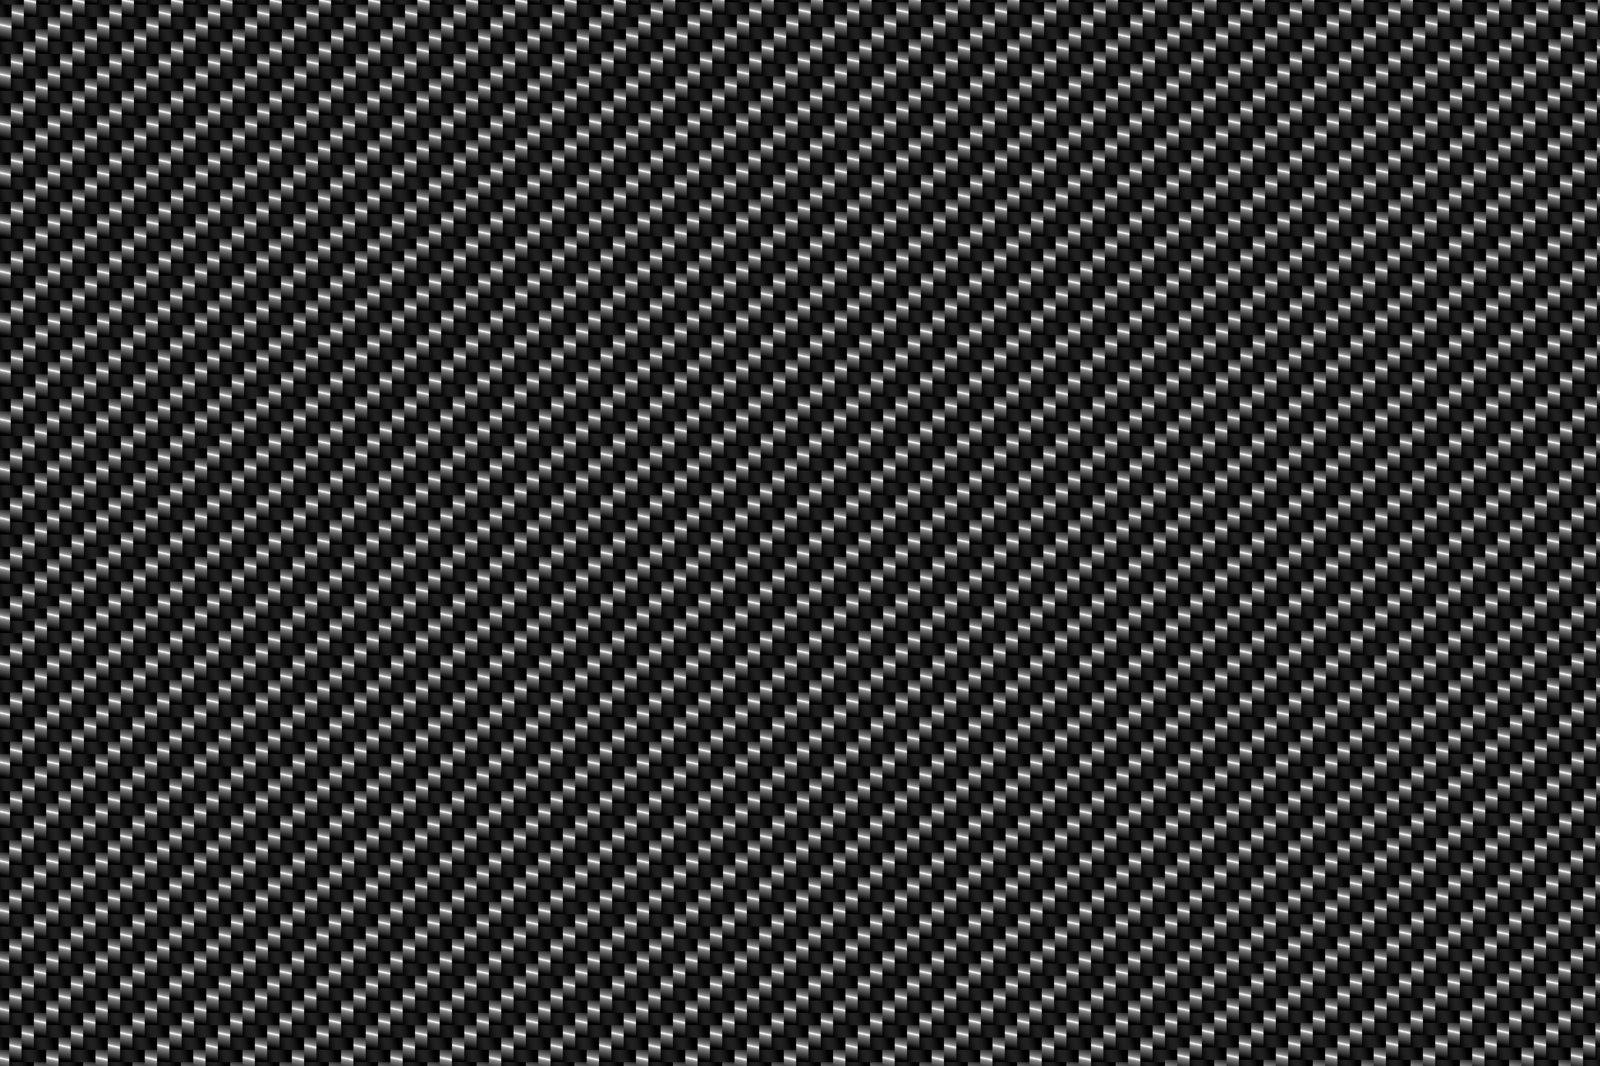 carbon fiber images | hd wallpapers pulse